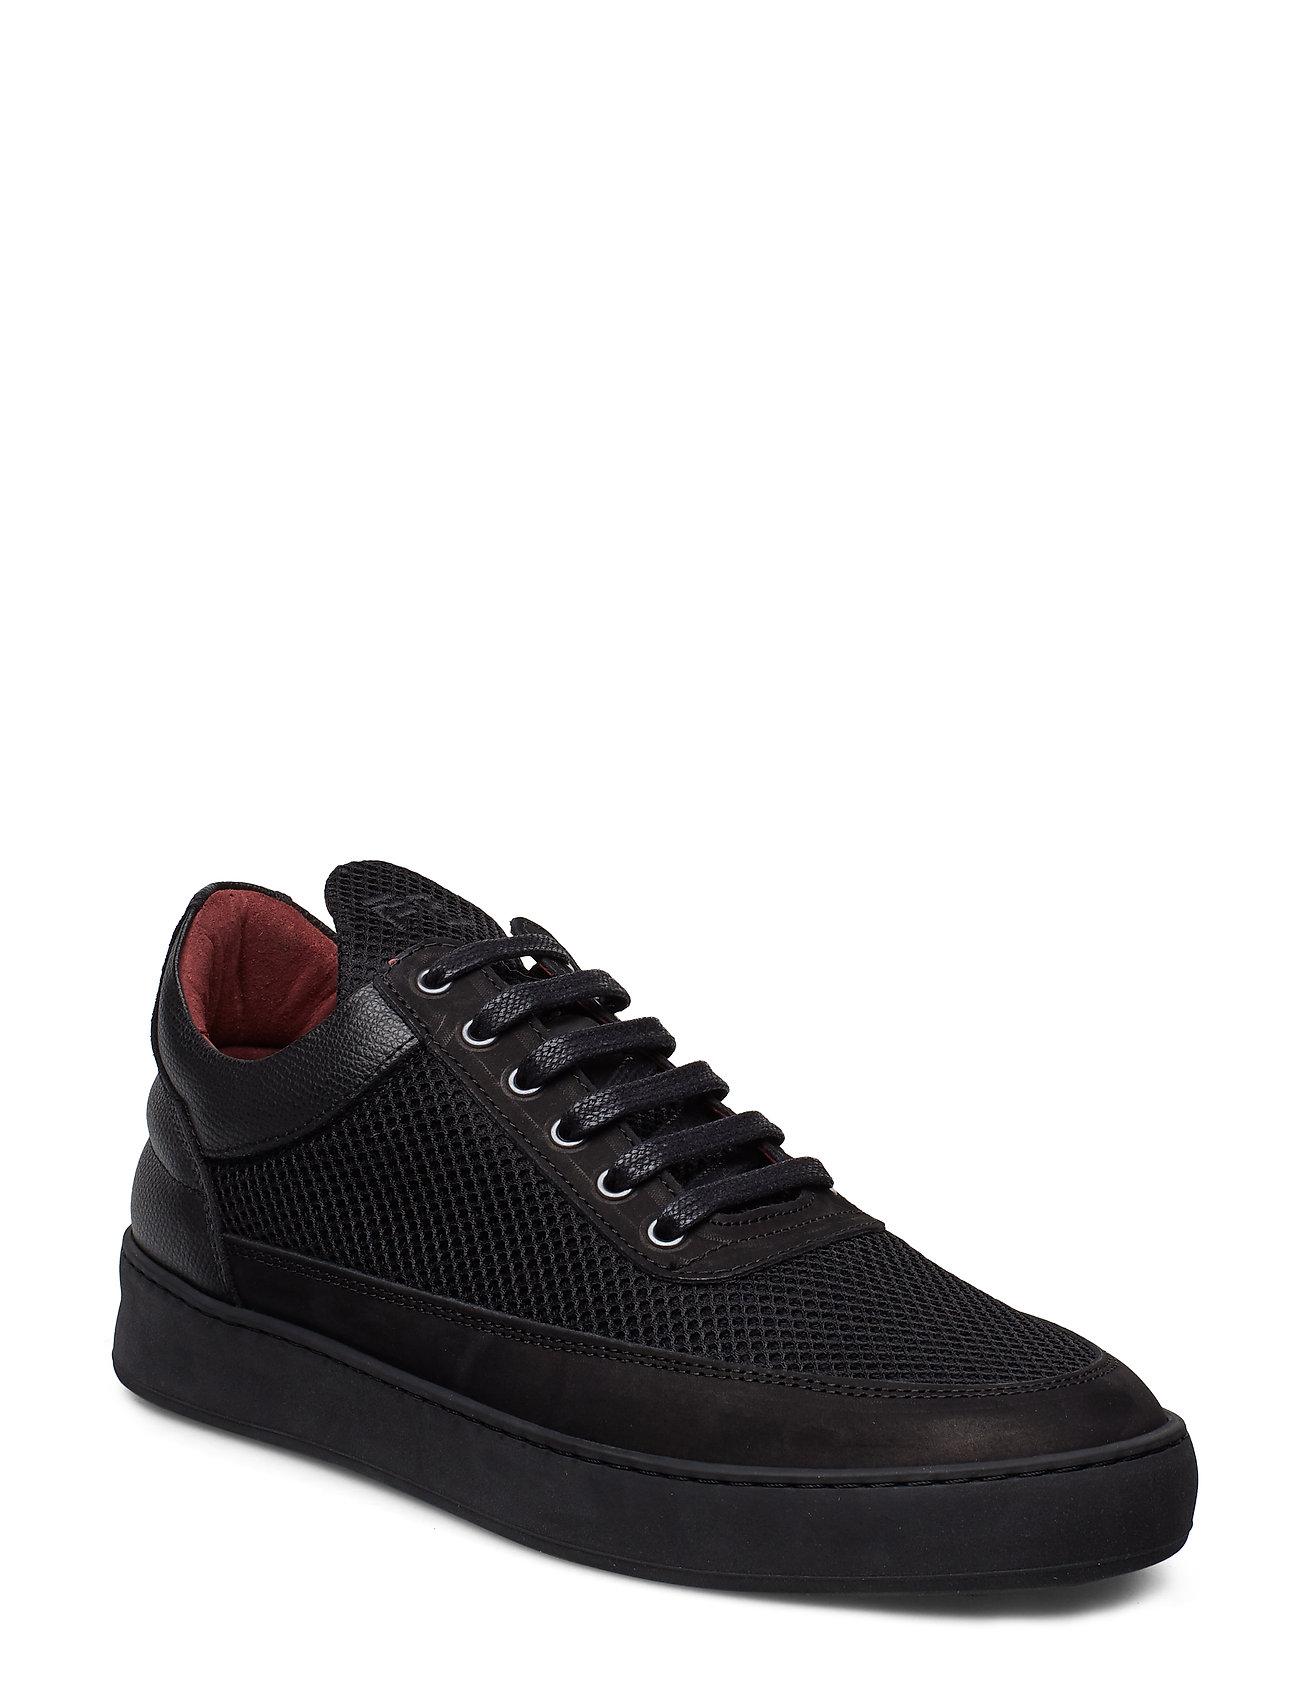 Image of Low Top Plain Infinity Low-top Sneakers Sort Filling Pieces (3203601945)